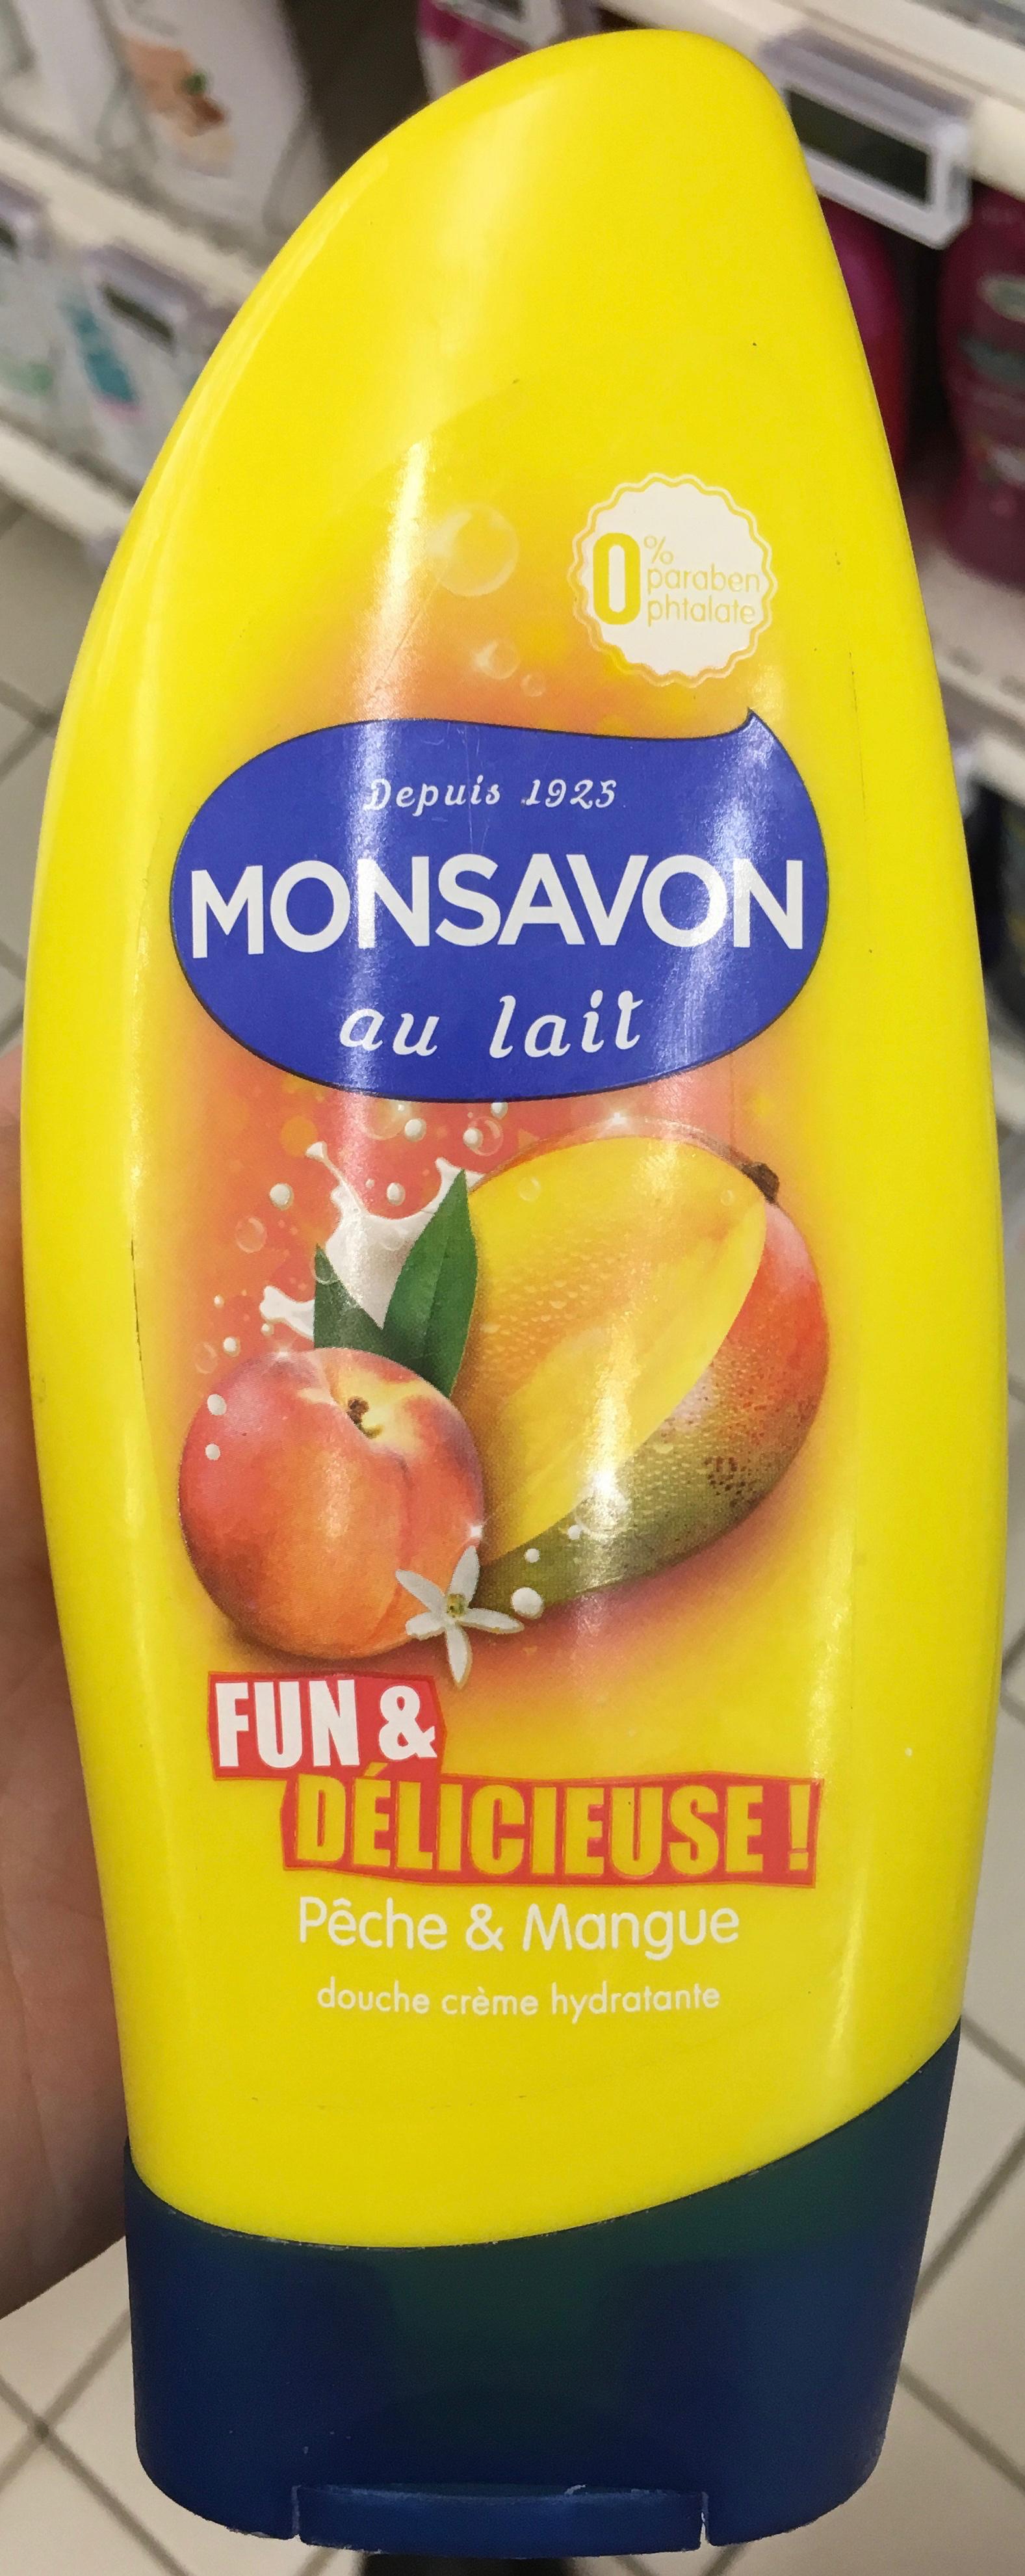 Fun & Délicieuse ! Pêche & Mangue - Product - fr